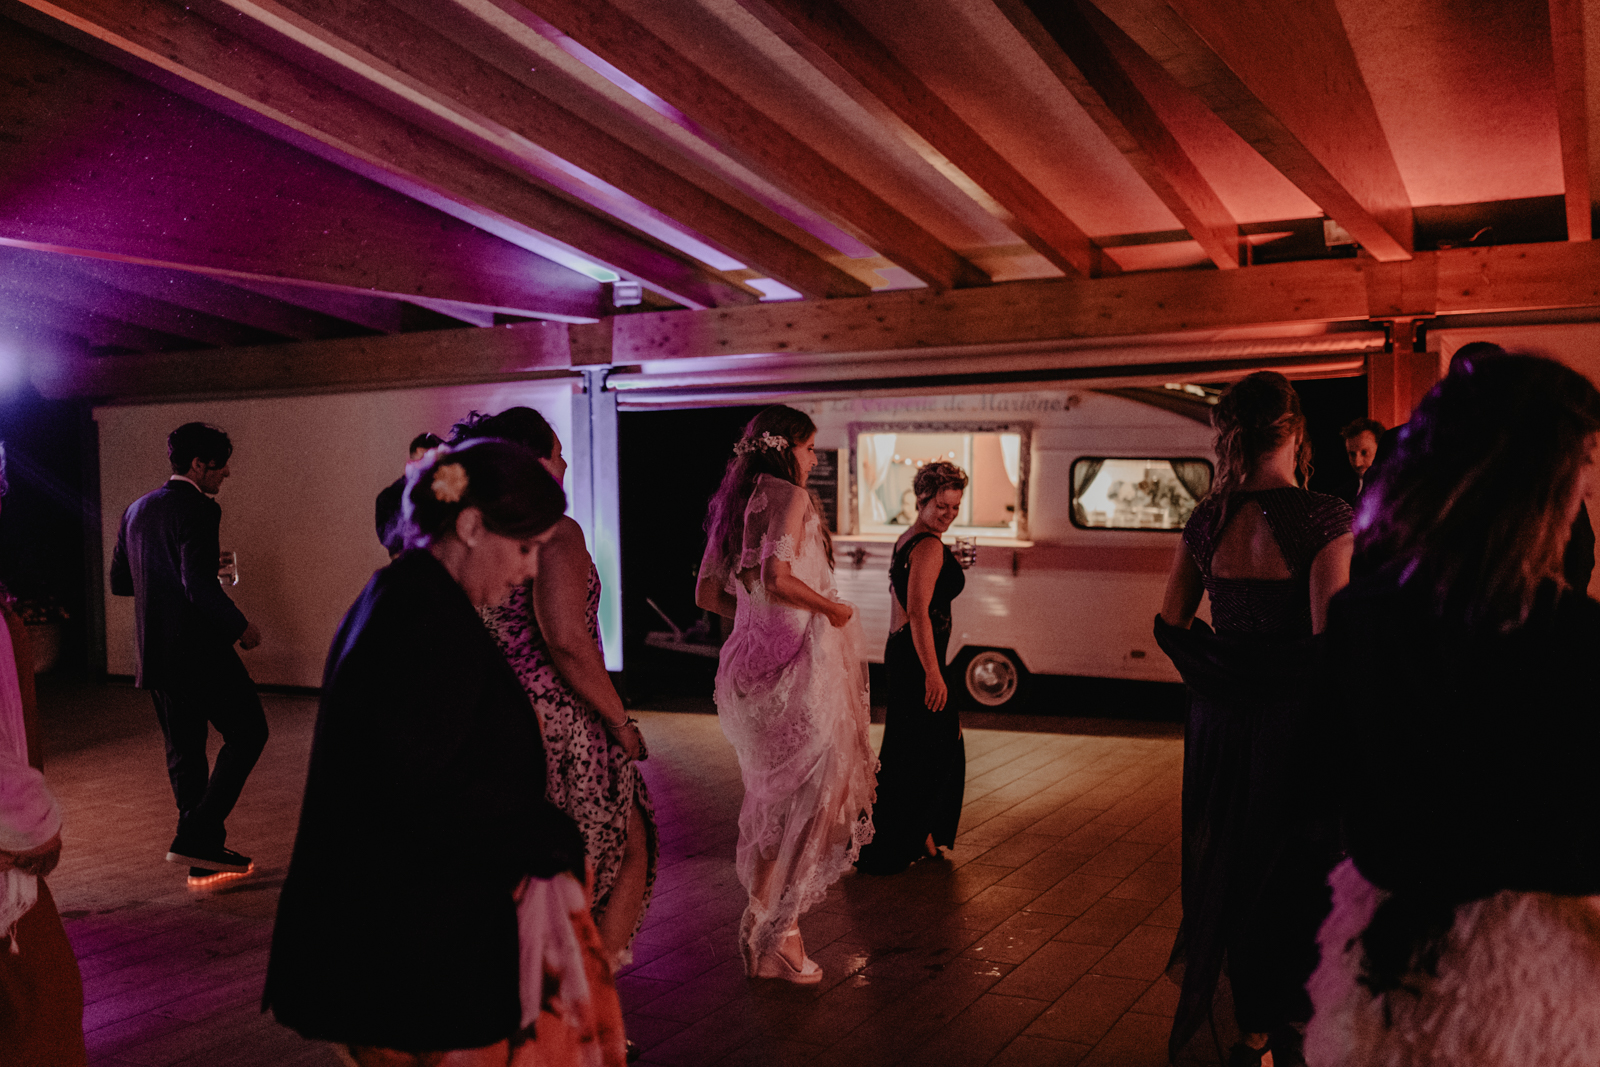 thenortherngirlphotography_photography_thenortherngirl_rebeccascabros_wedding_weddingphotography_weddingphotographer_barcelona_bodaenbarcelona_bodaenmaselmarti_bodarogeryvane-1020.jpg